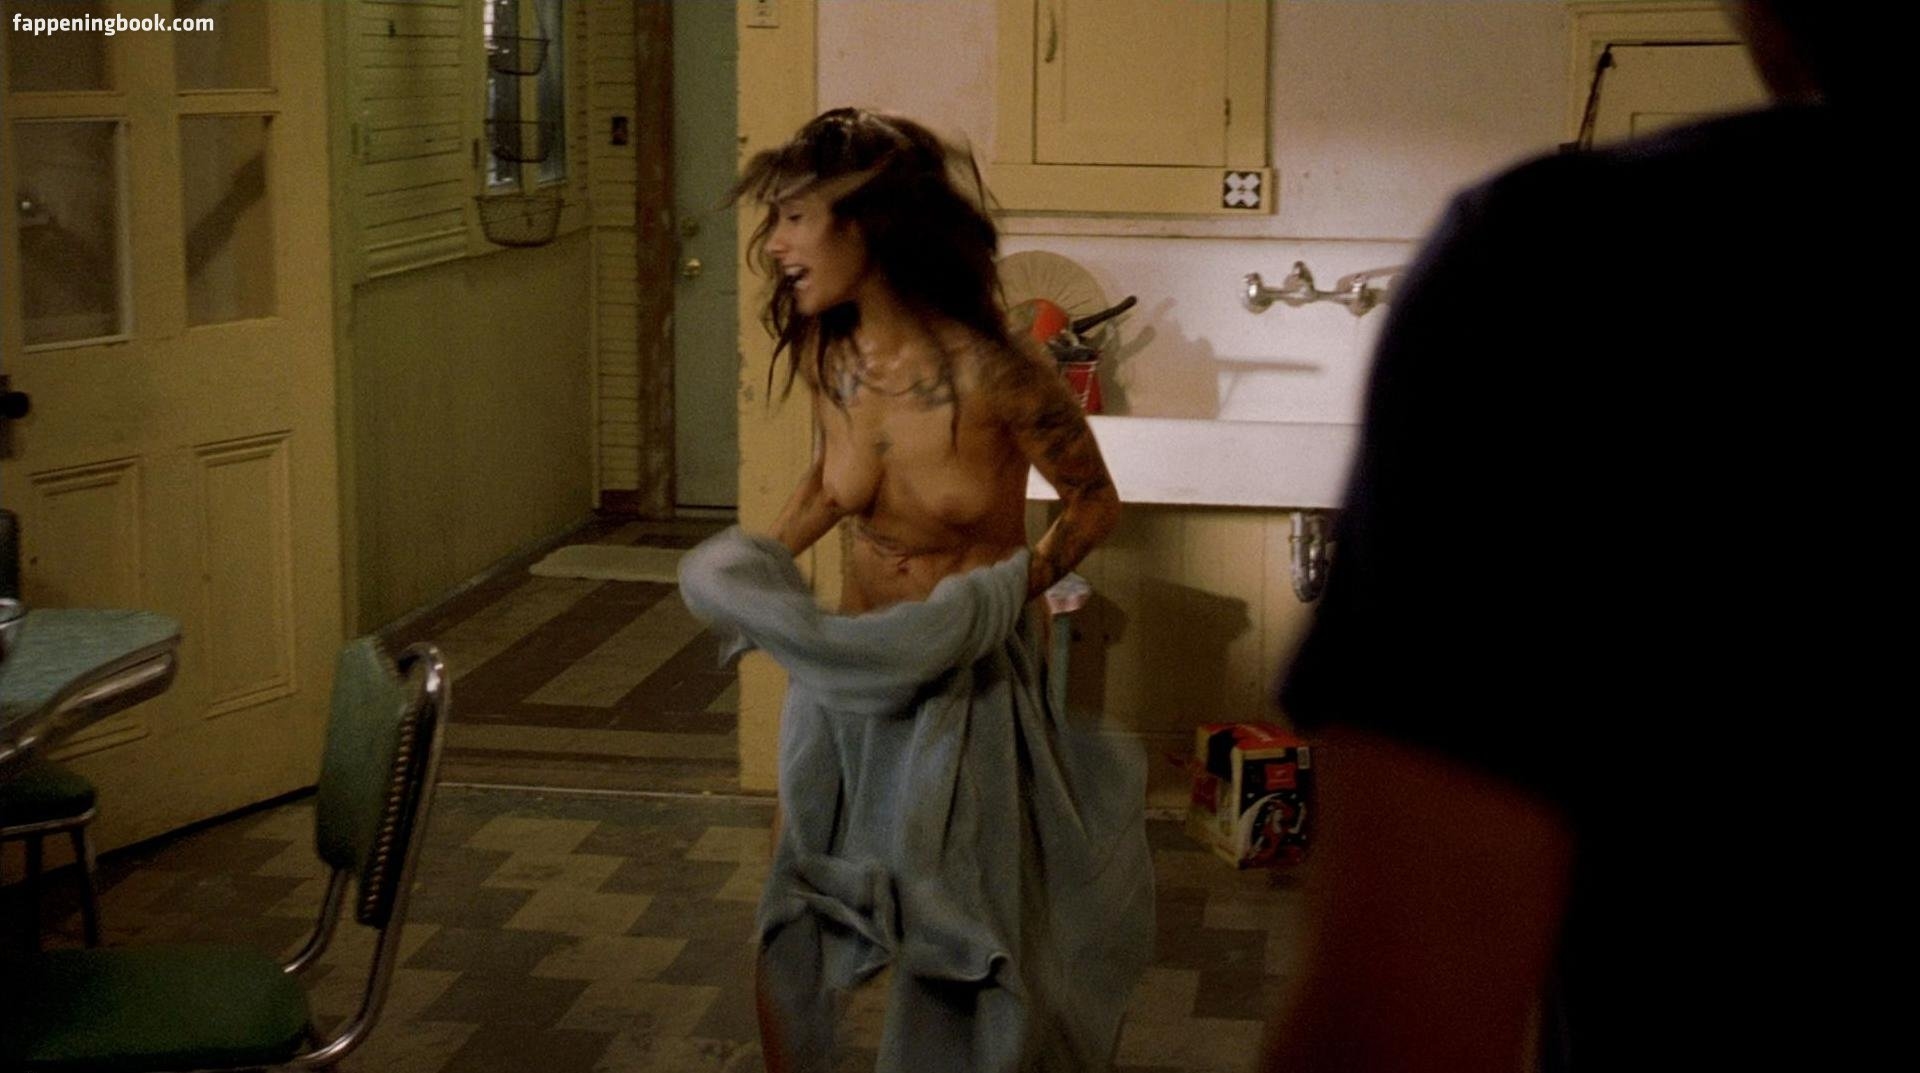 Andrea Osvárt Nuda sarah shahi nude, sexy, the fappening, uncensored - photo